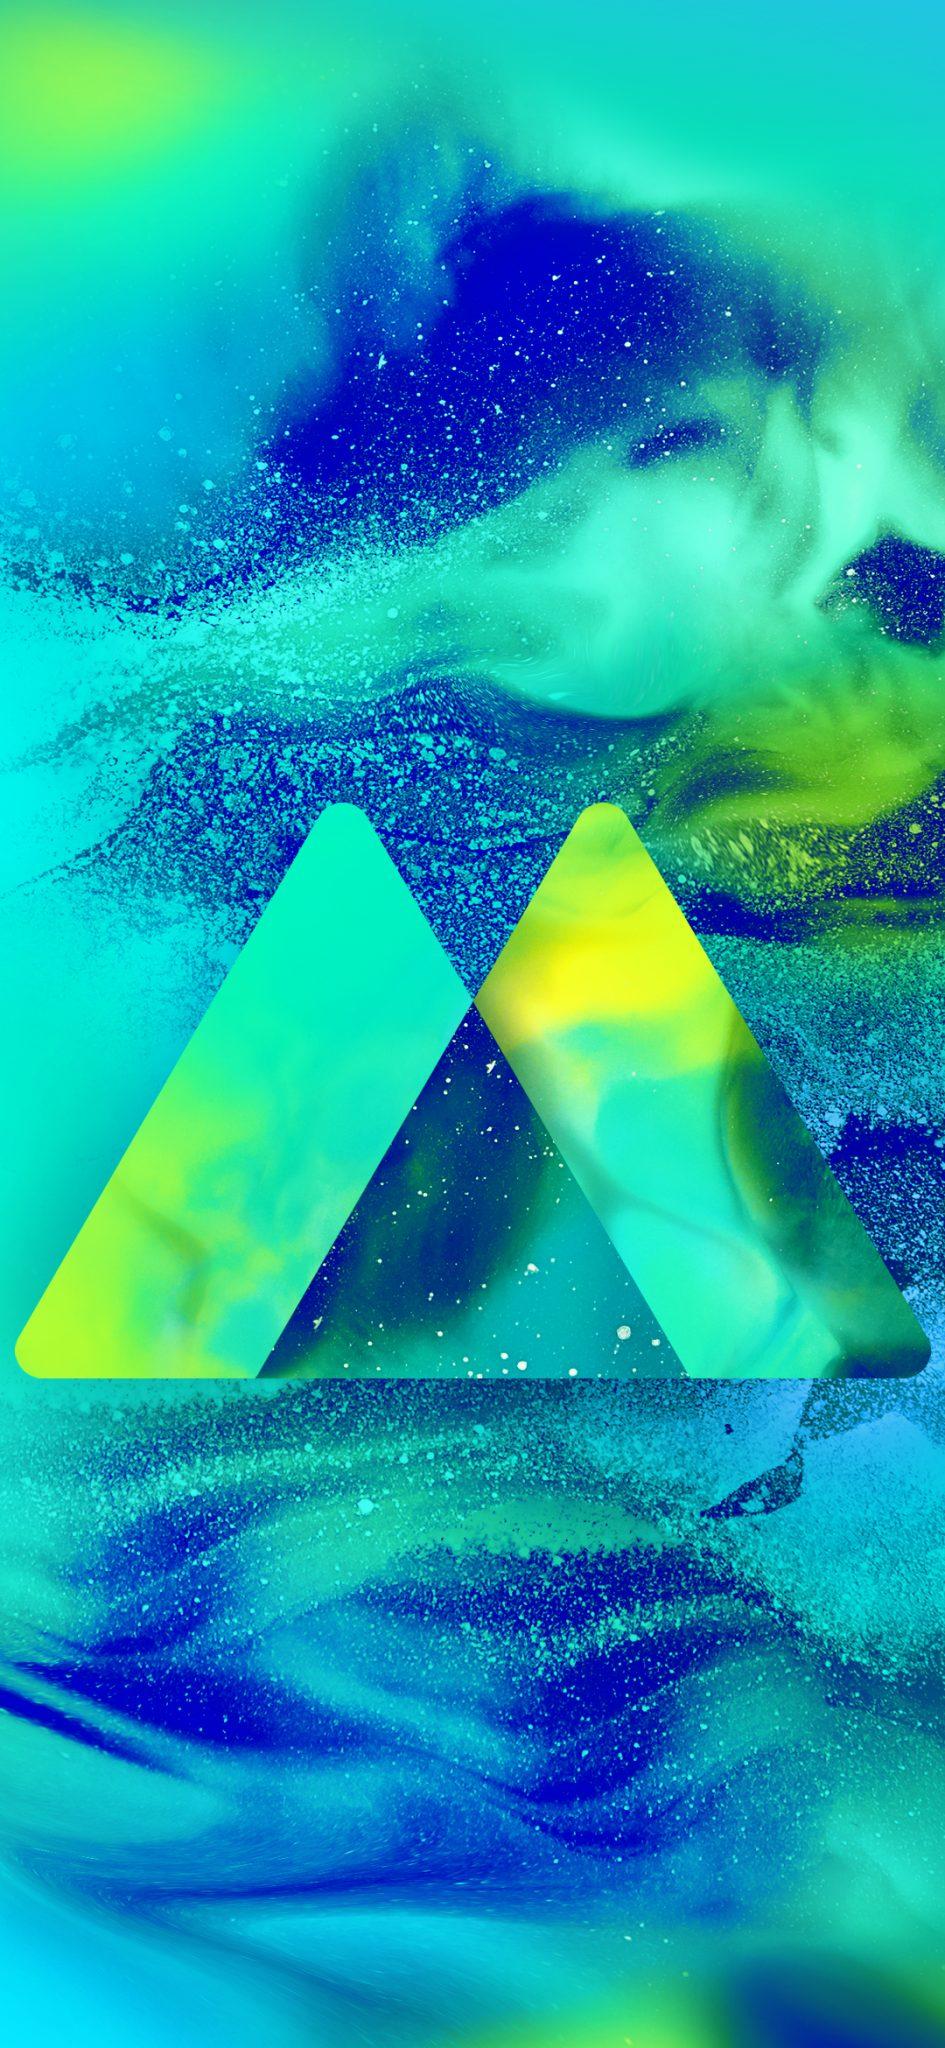 galaxy-m40-wallpaper-TechFoogle-04